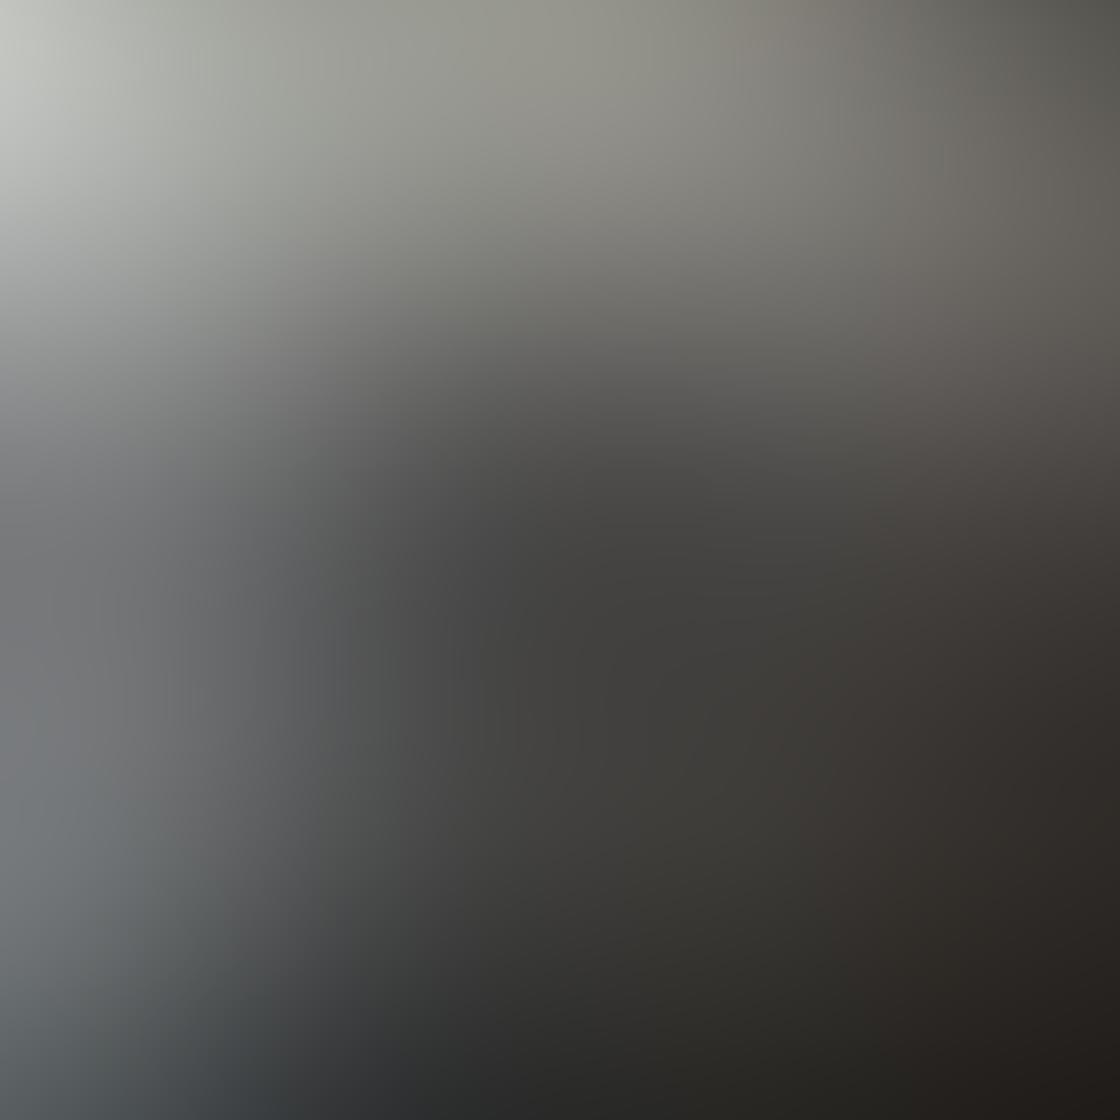 iPhone Photos Low Angle 5